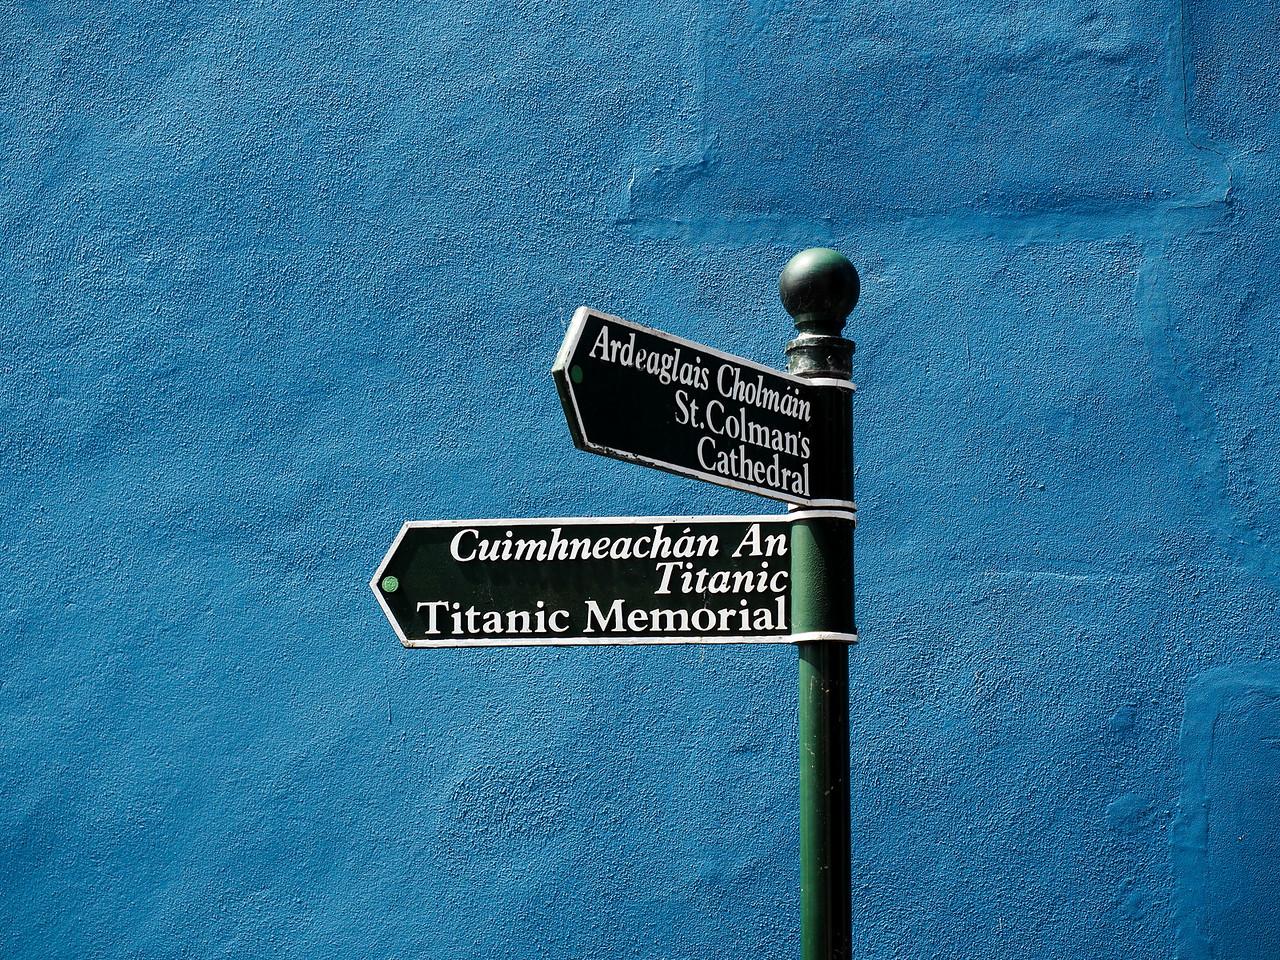 Cobh street sign